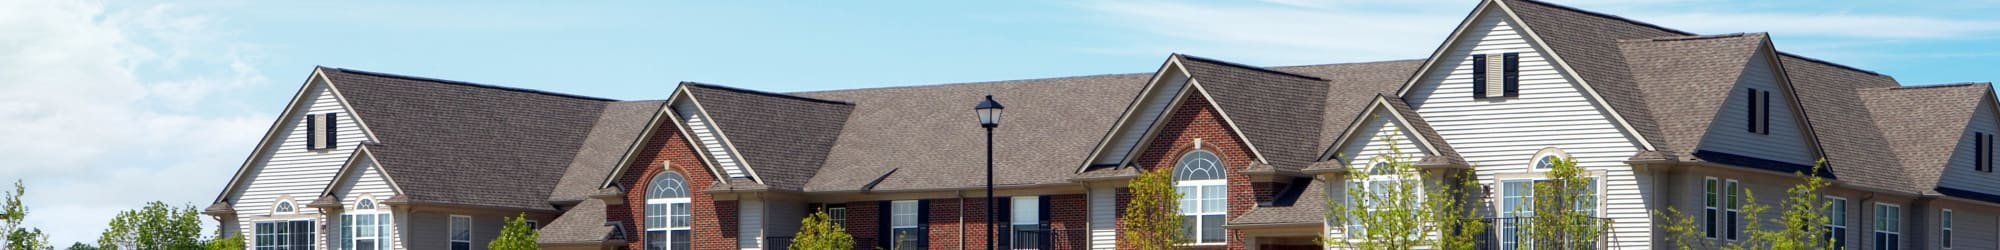 View photos of Legends Rosewood Village in Ypsilanti, Michigan